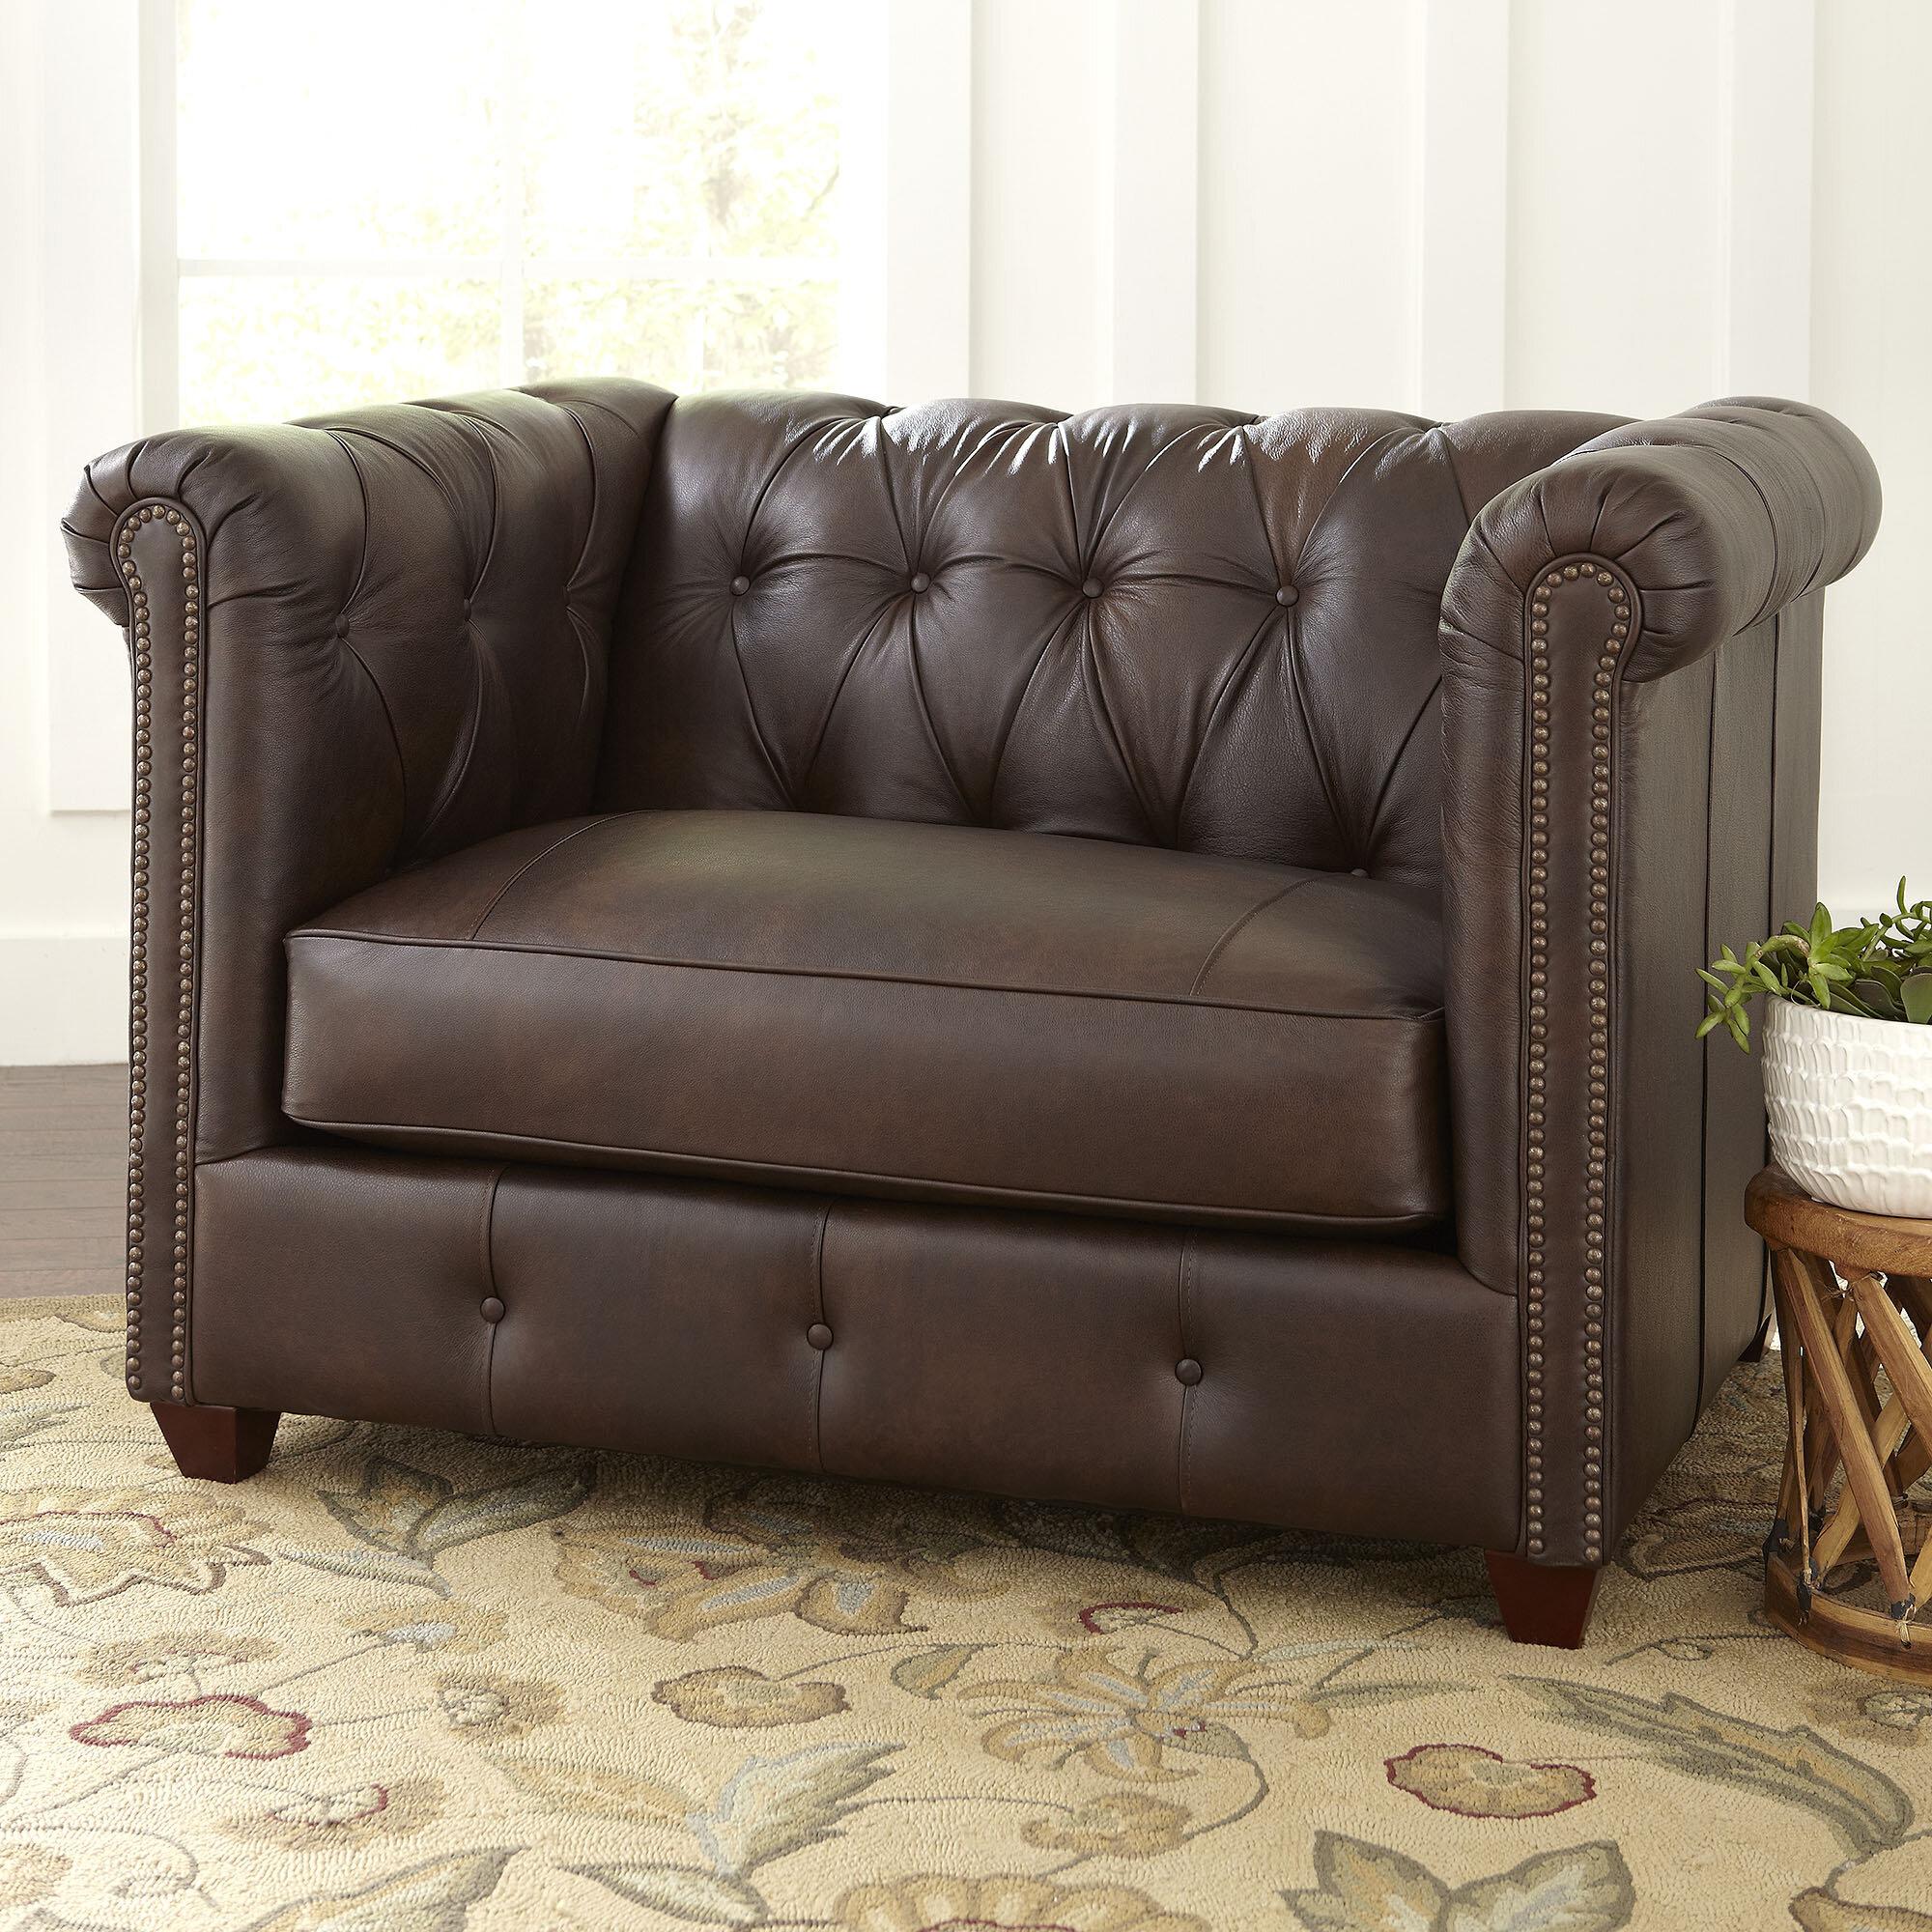 Genial Birch Lane™ Hawthorn Leather Chair | Wayfair